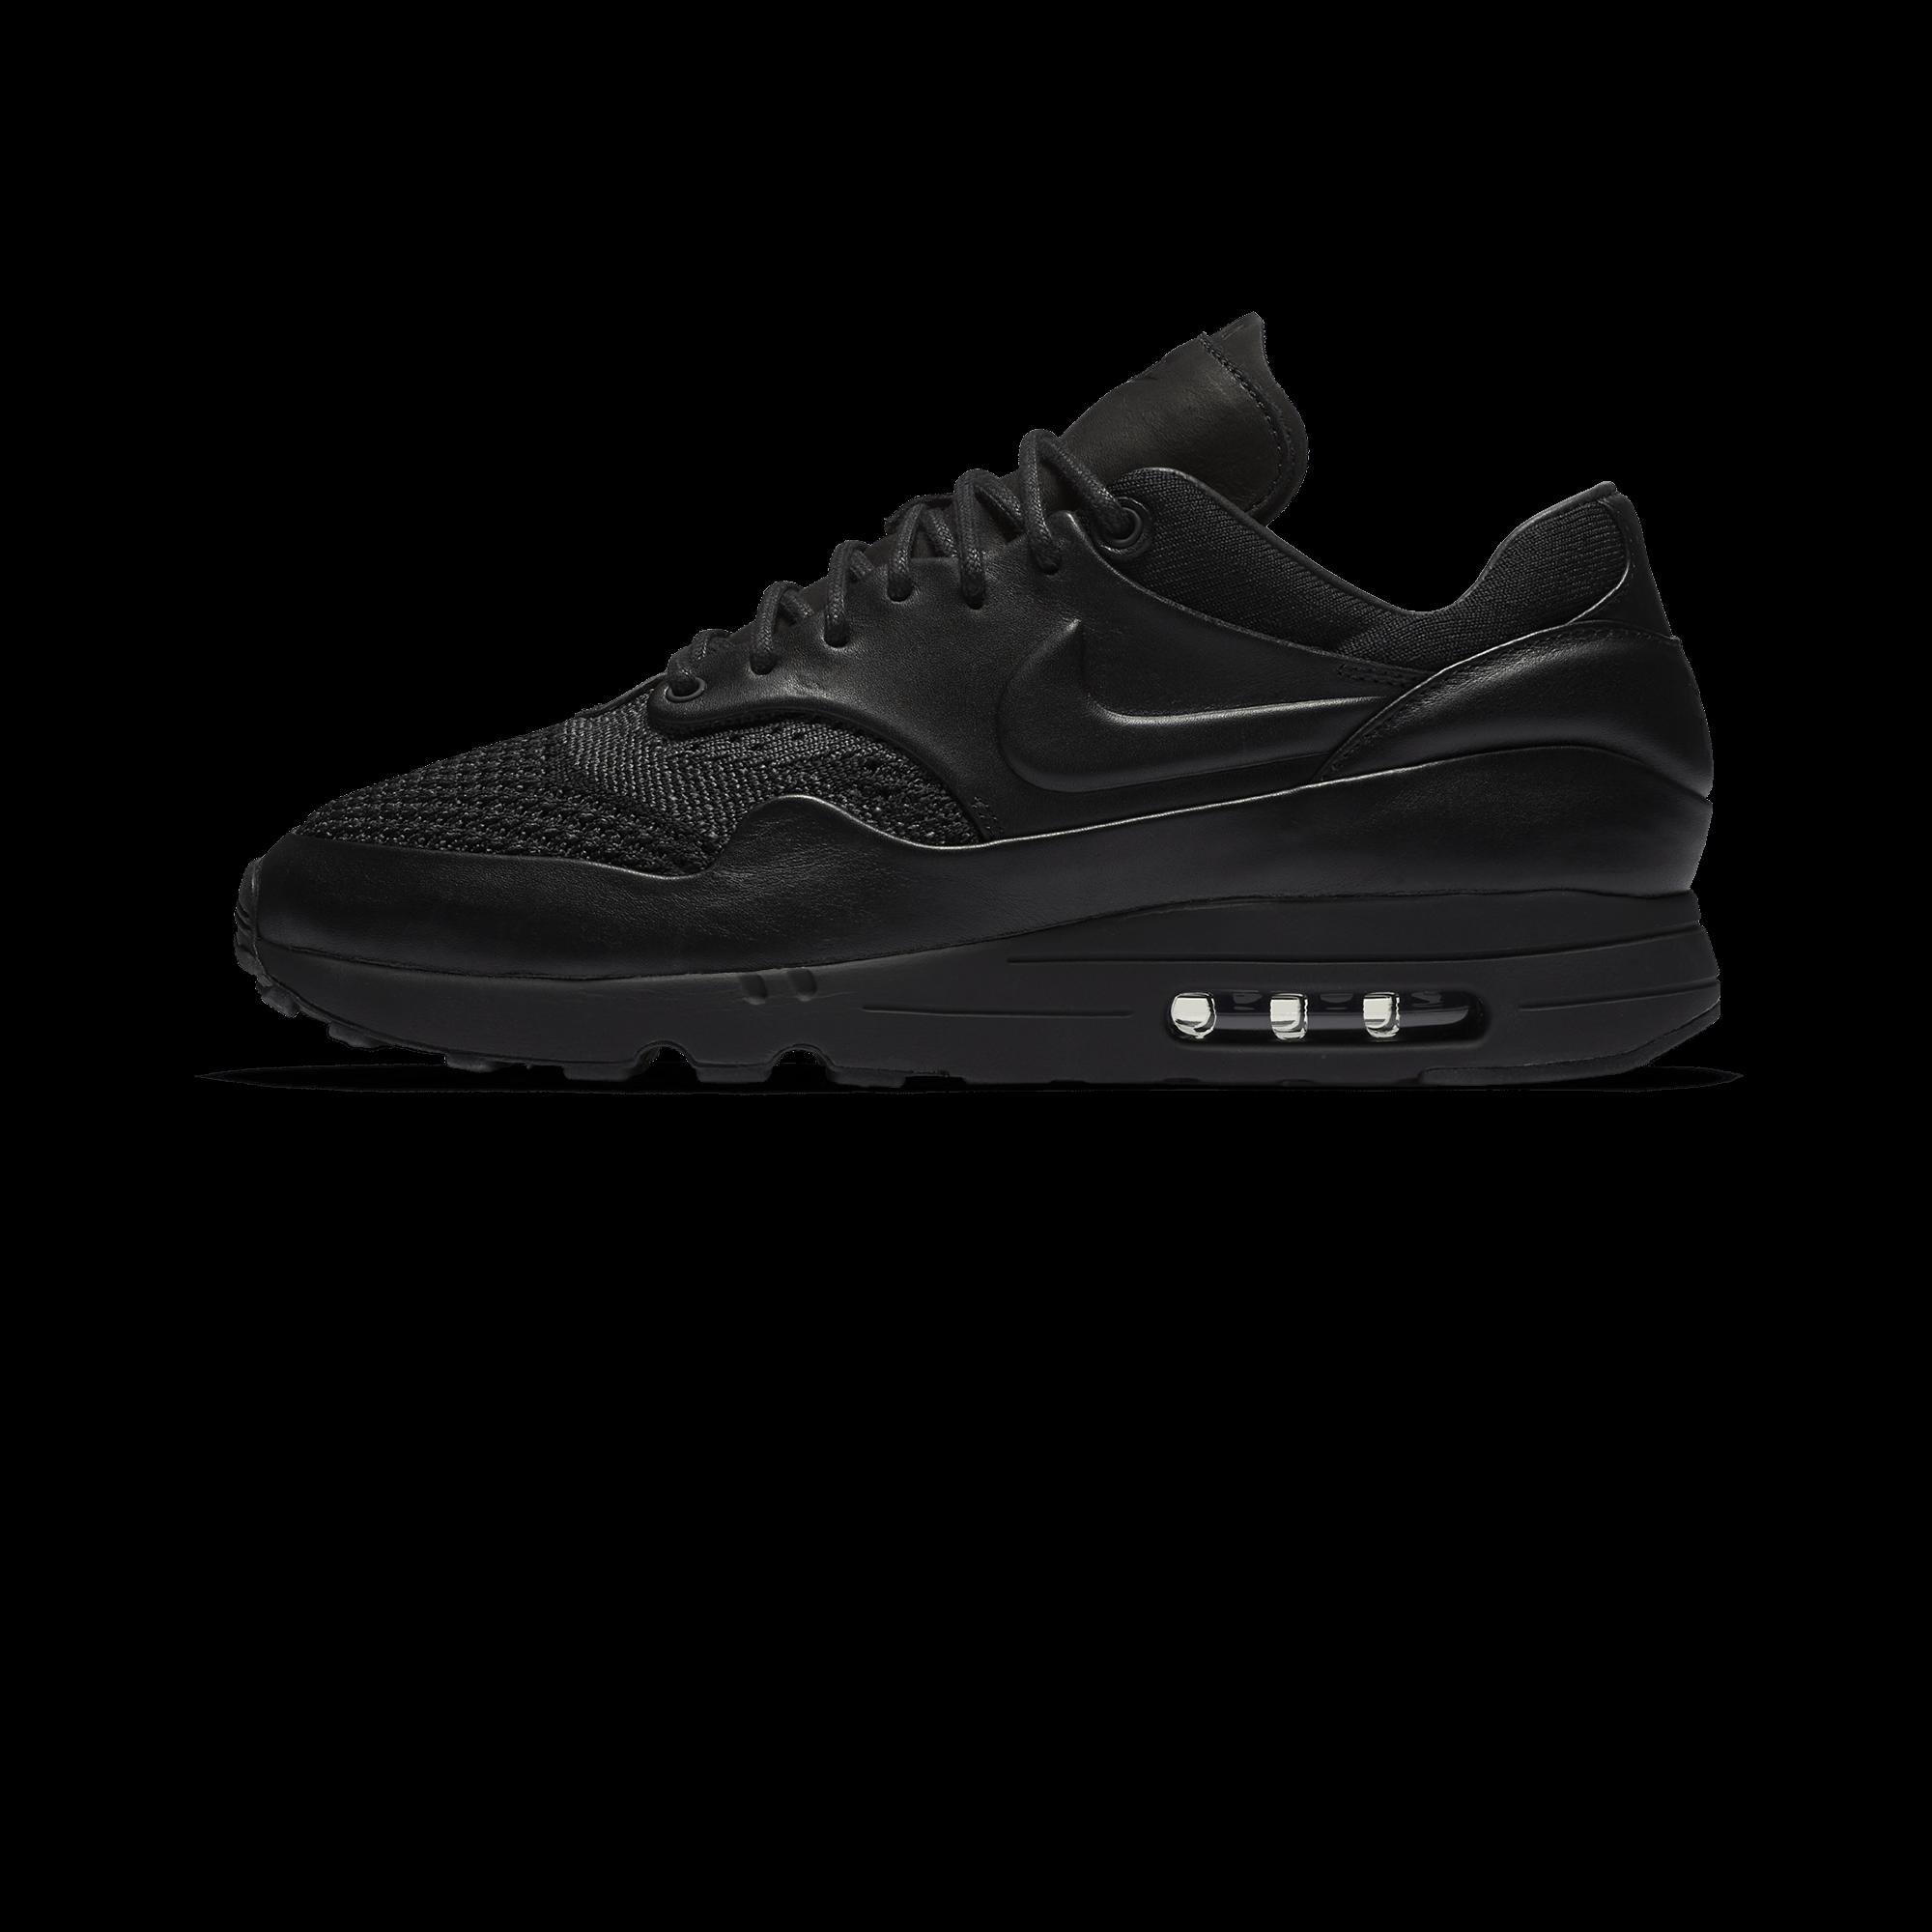 d85b8b38c78 NikeLab Air Max 1 Flyknit Royal x Arthur Huang black anthracite ...